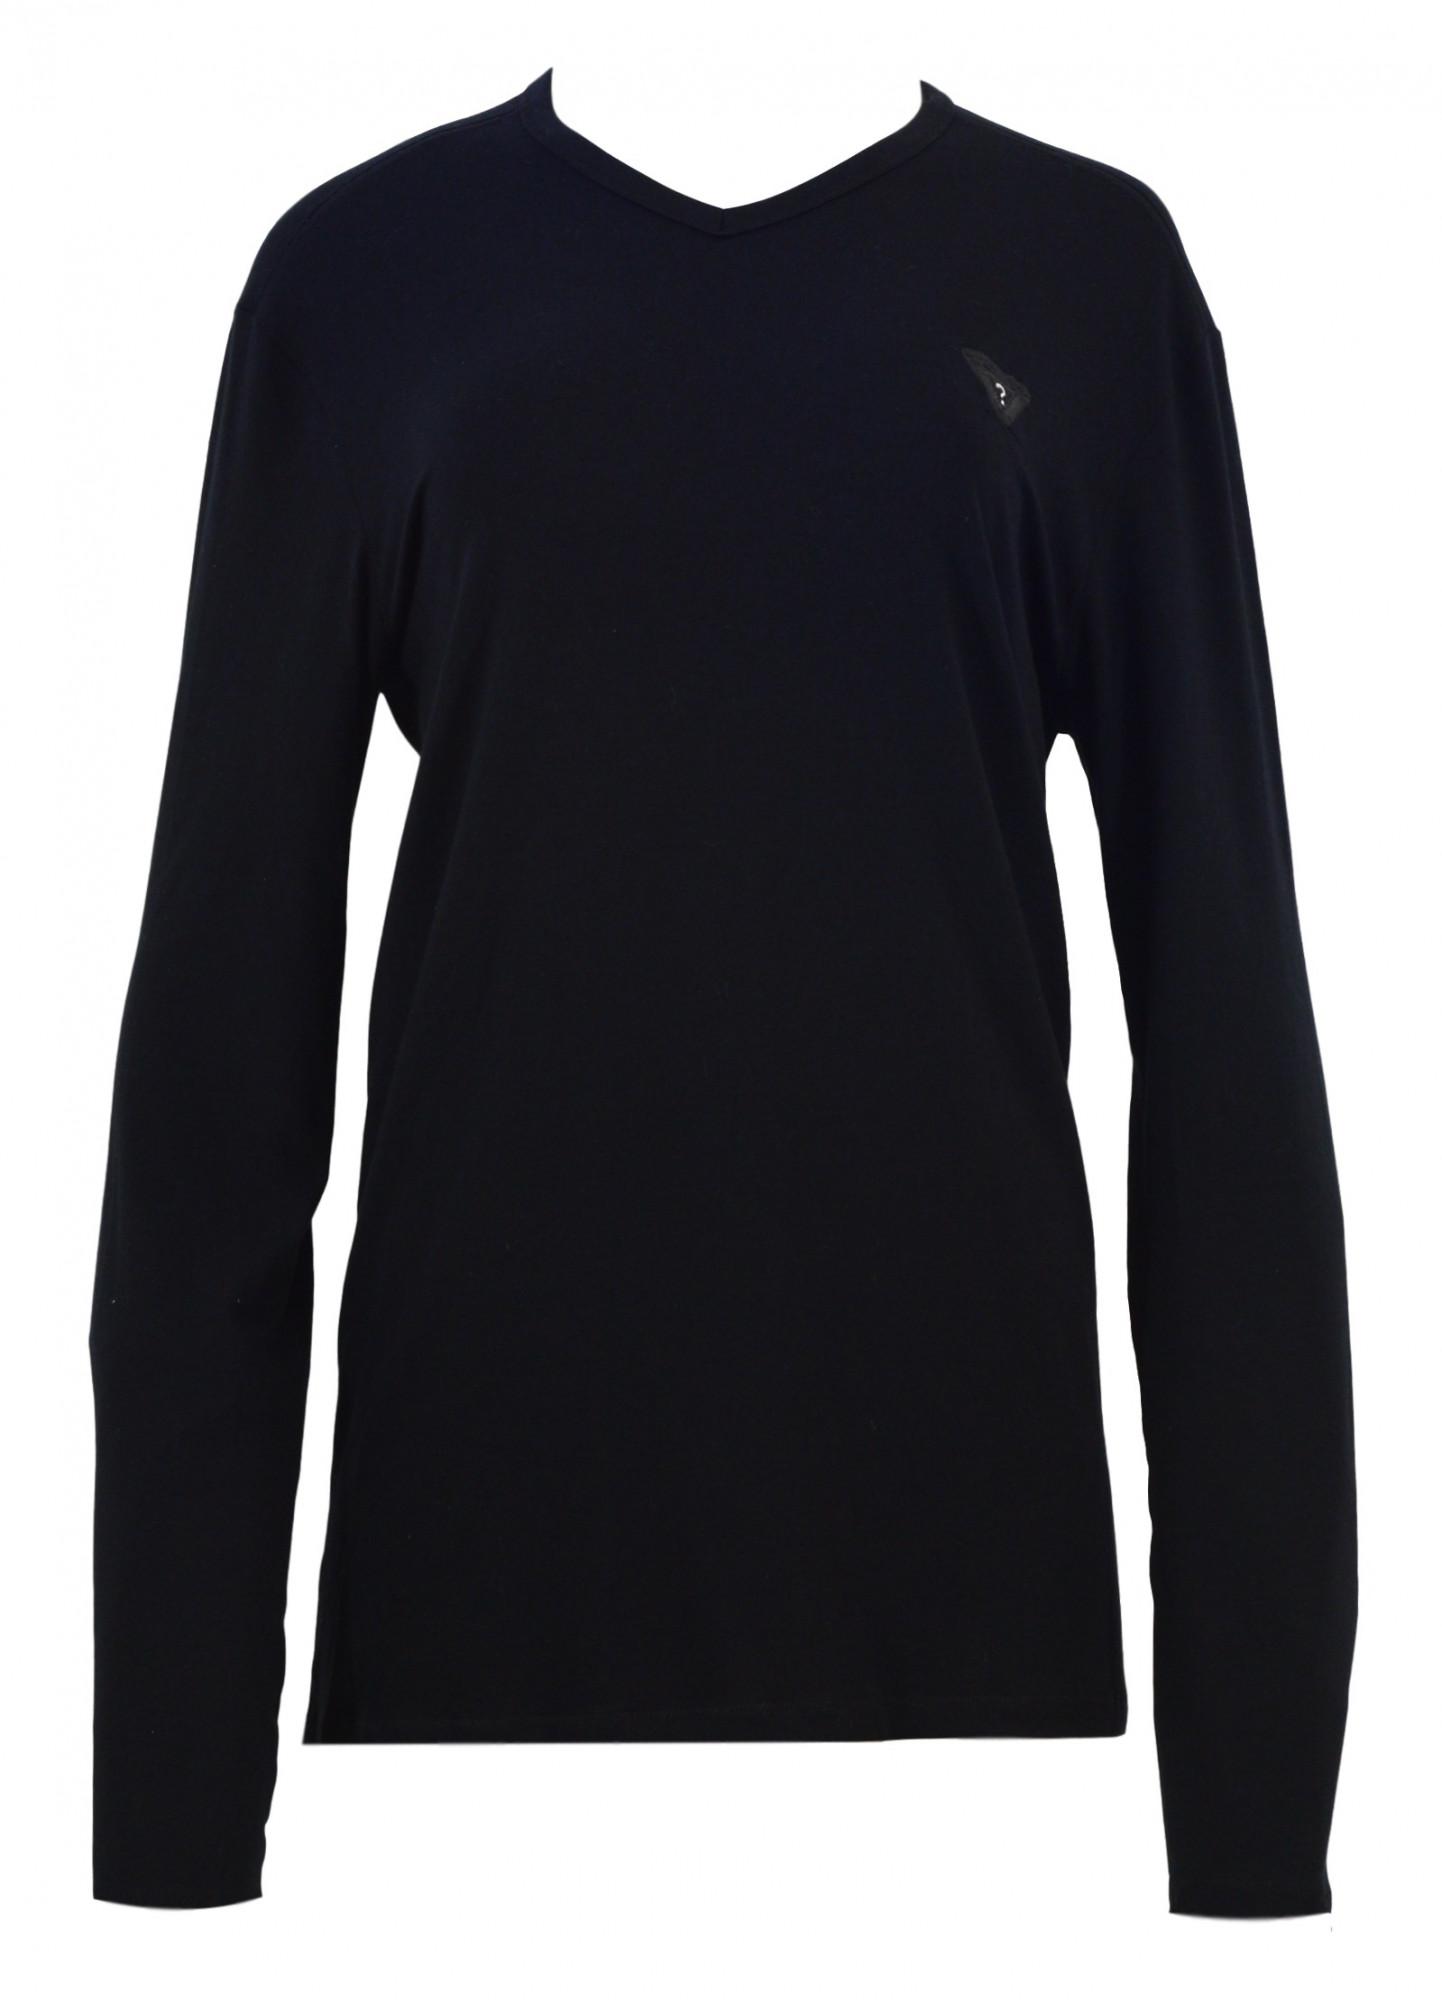 Dámské triko UB6U2C - Guess Barva: černá, Velikost: M